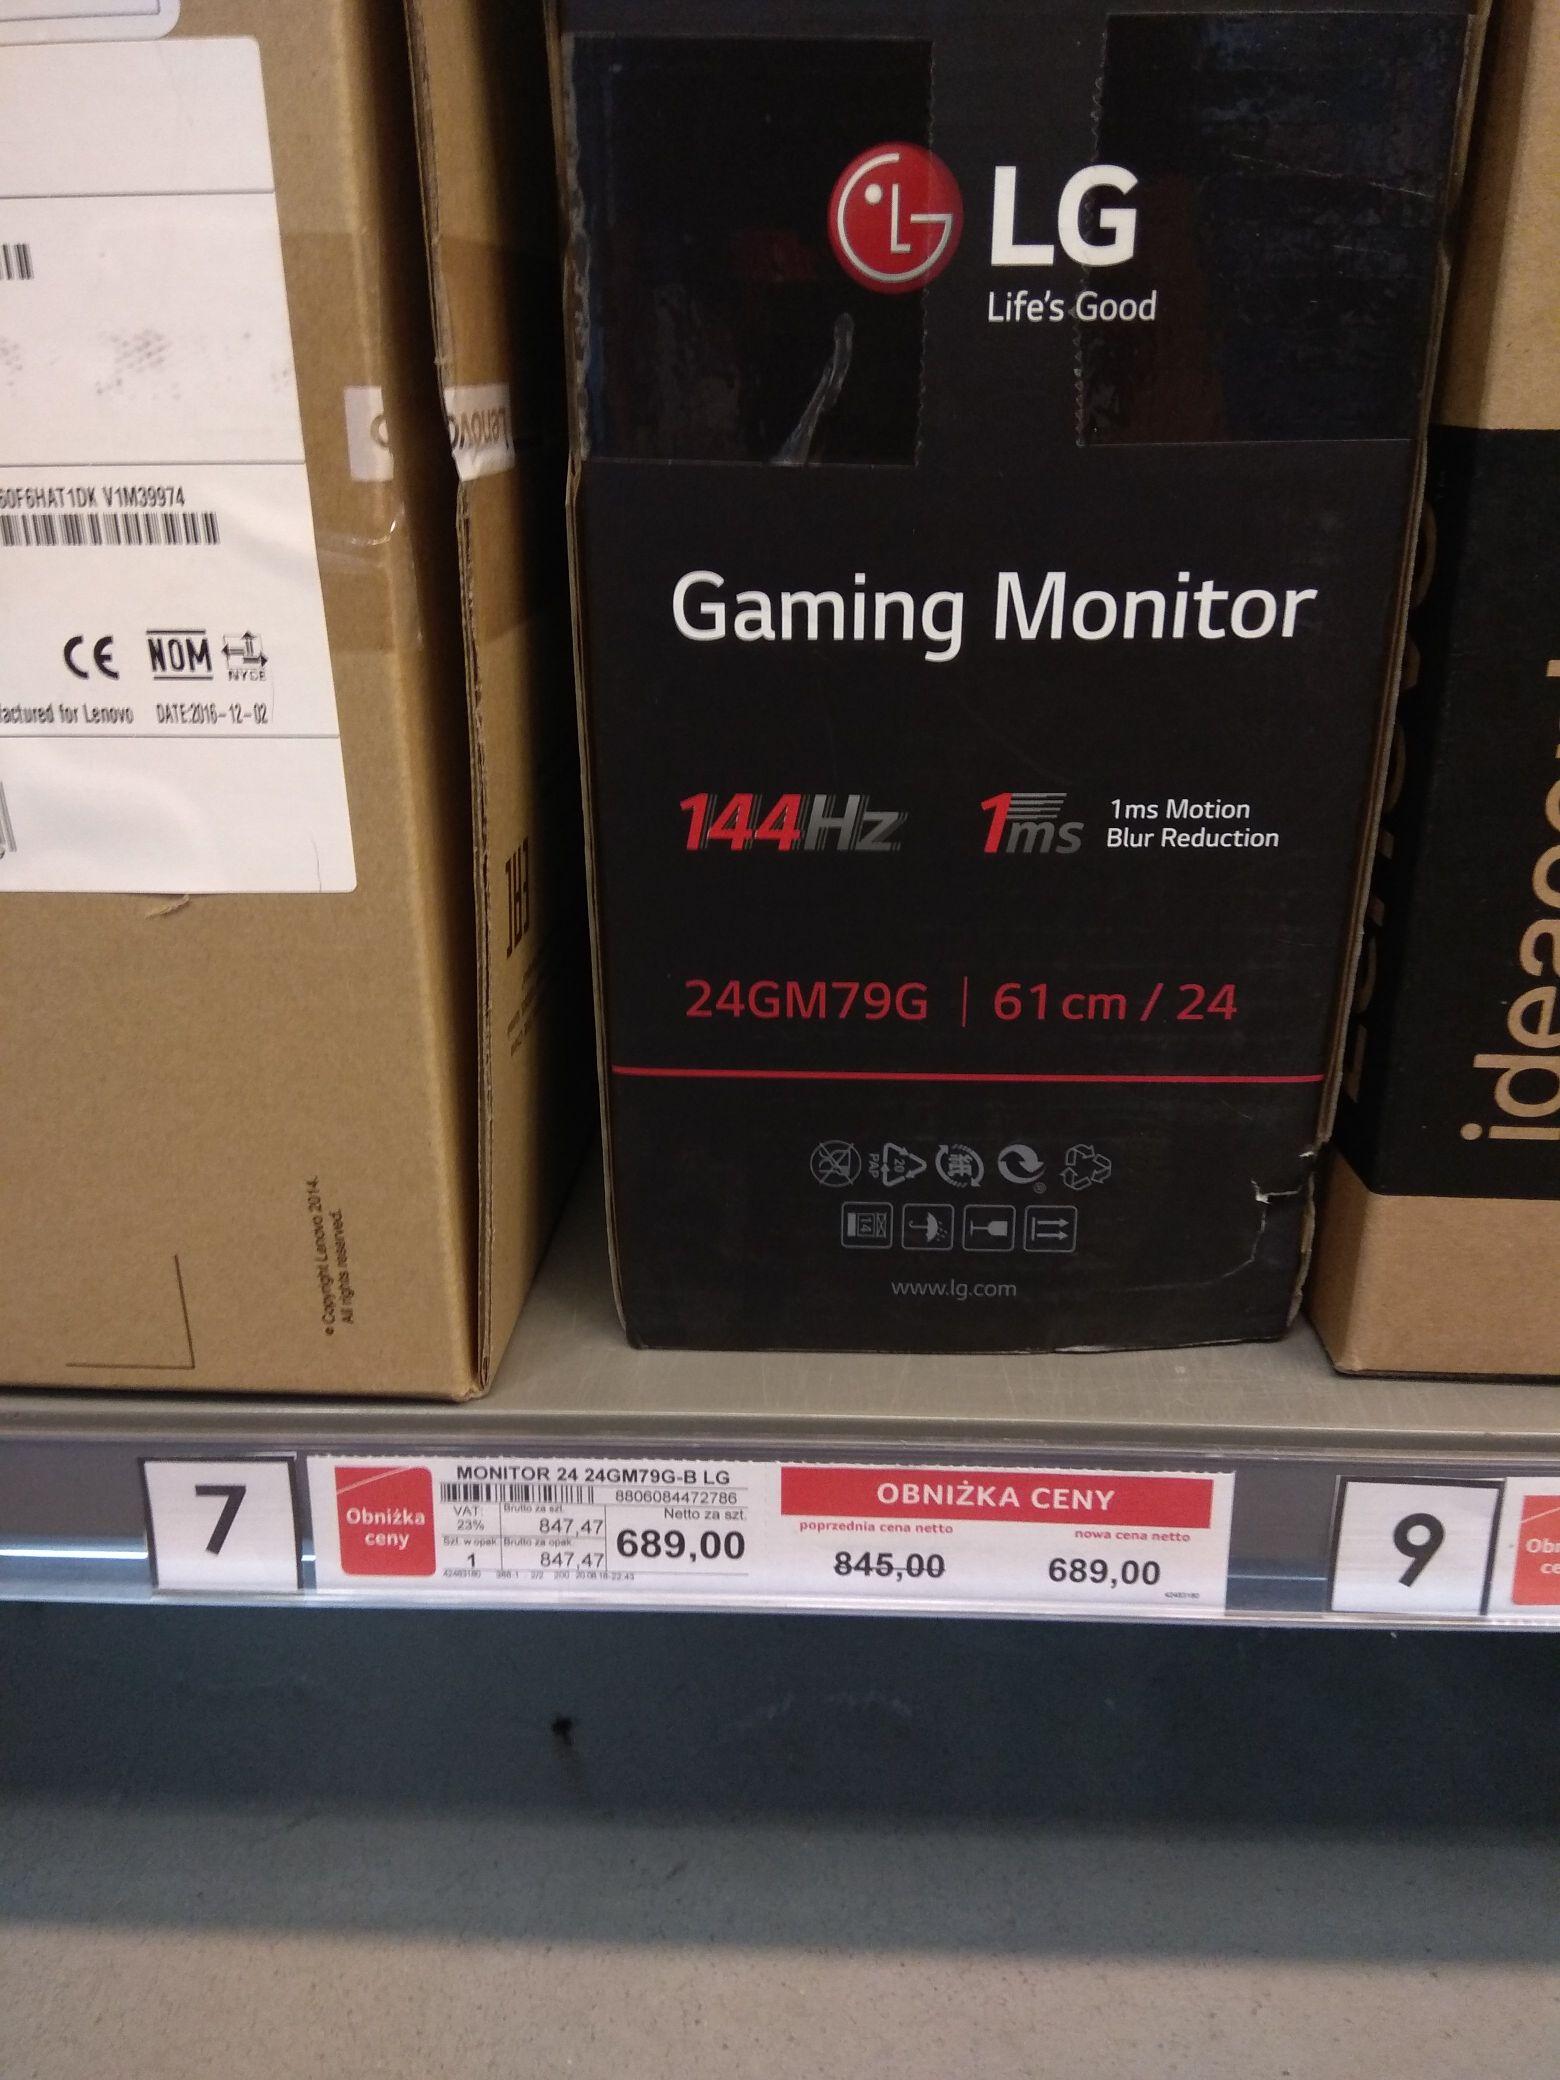 Monitor gamingowy LG 24gm79g 144hz 1ms selgros